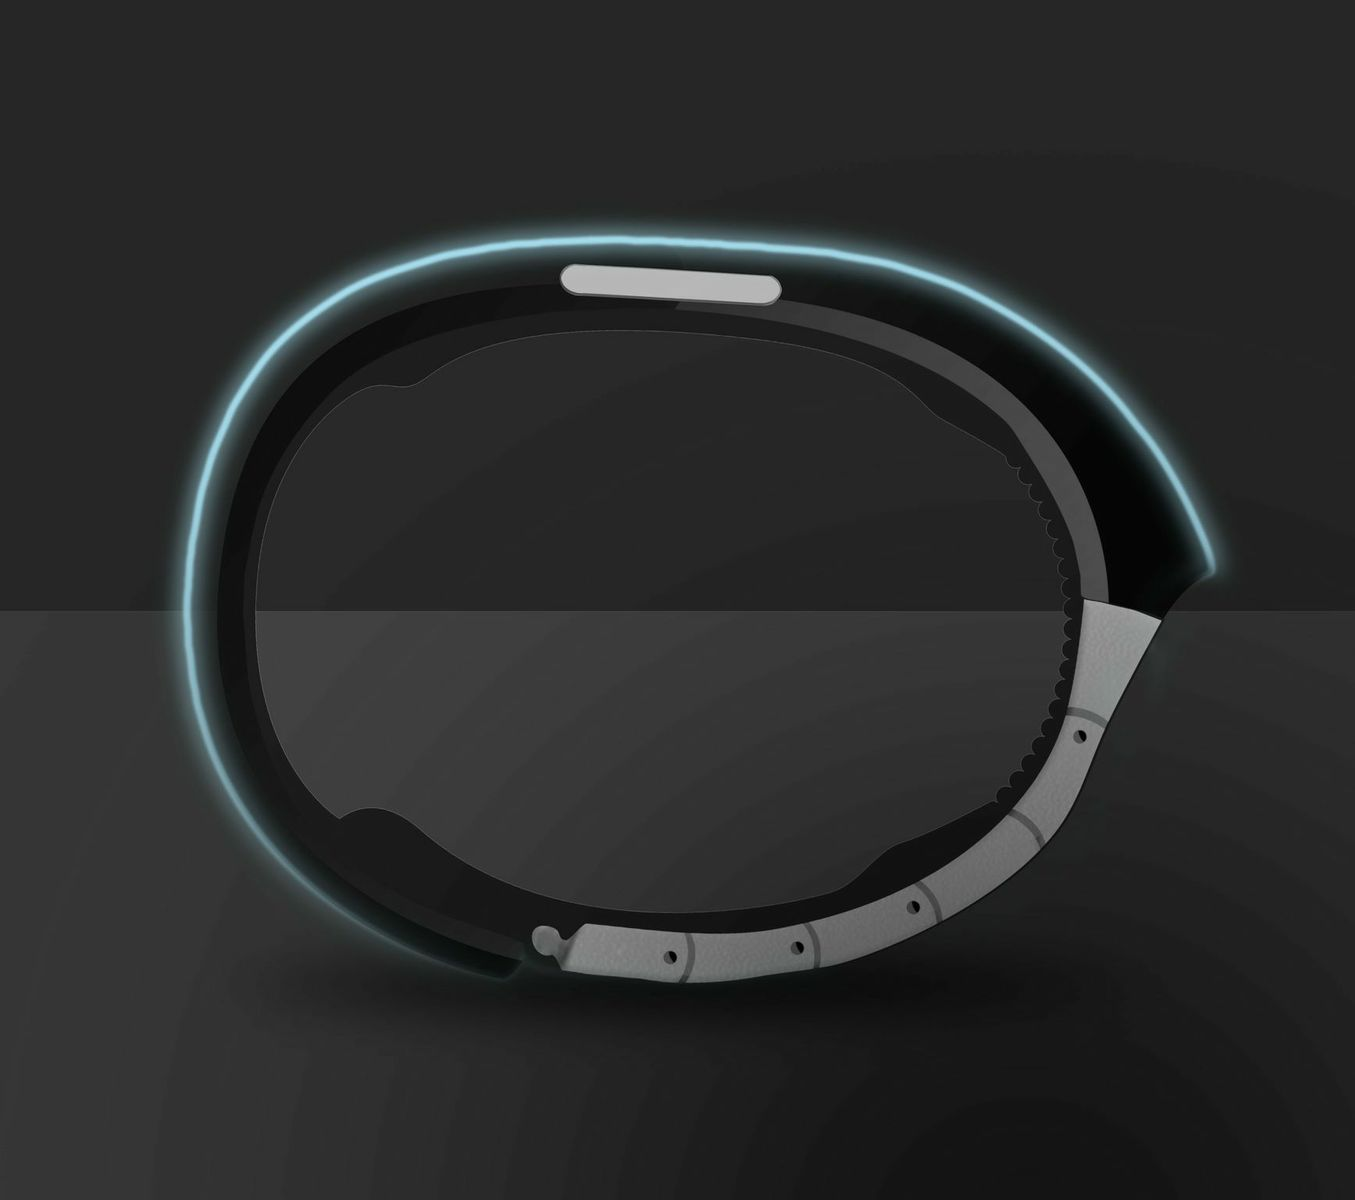 Samsung-Galaxy-Gear-Concept-Flexibile-5